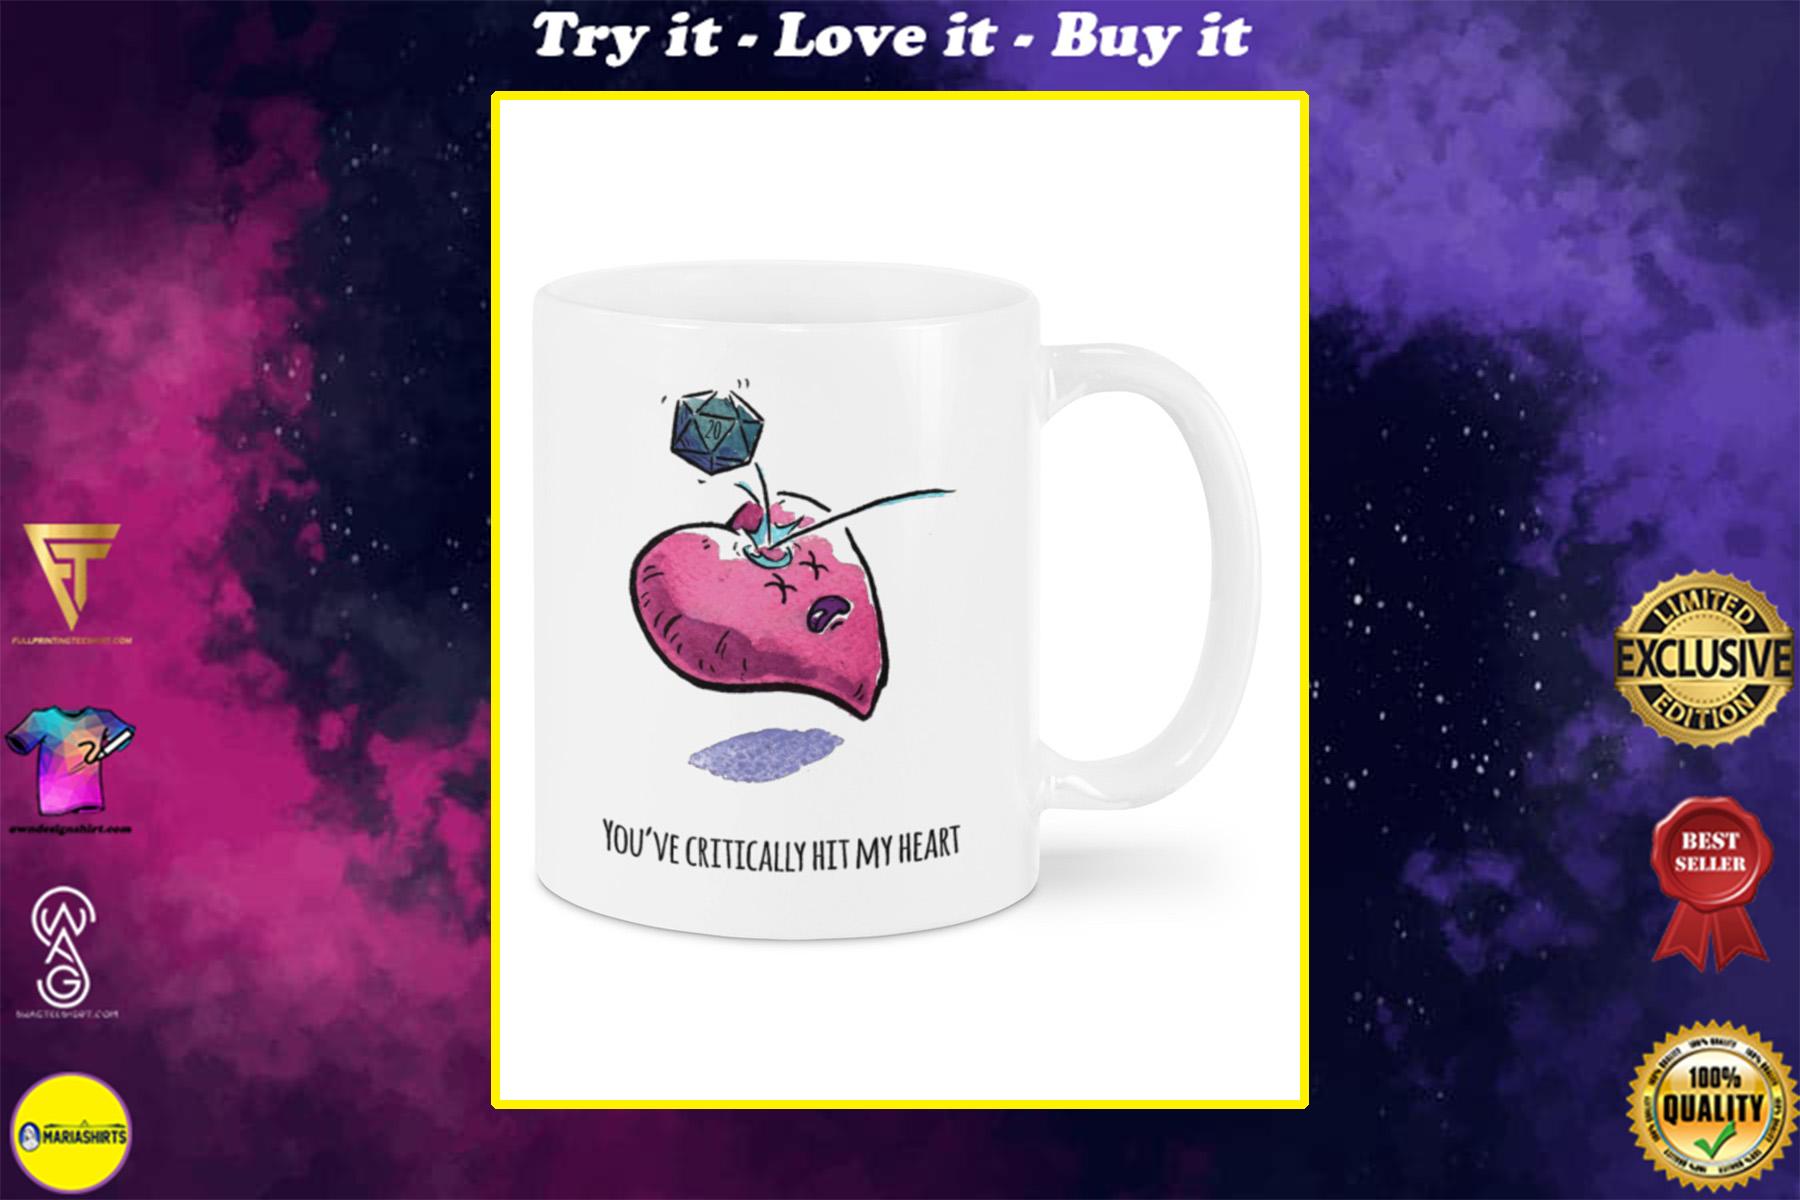 youre critically hit my heart happy valentine's day mug